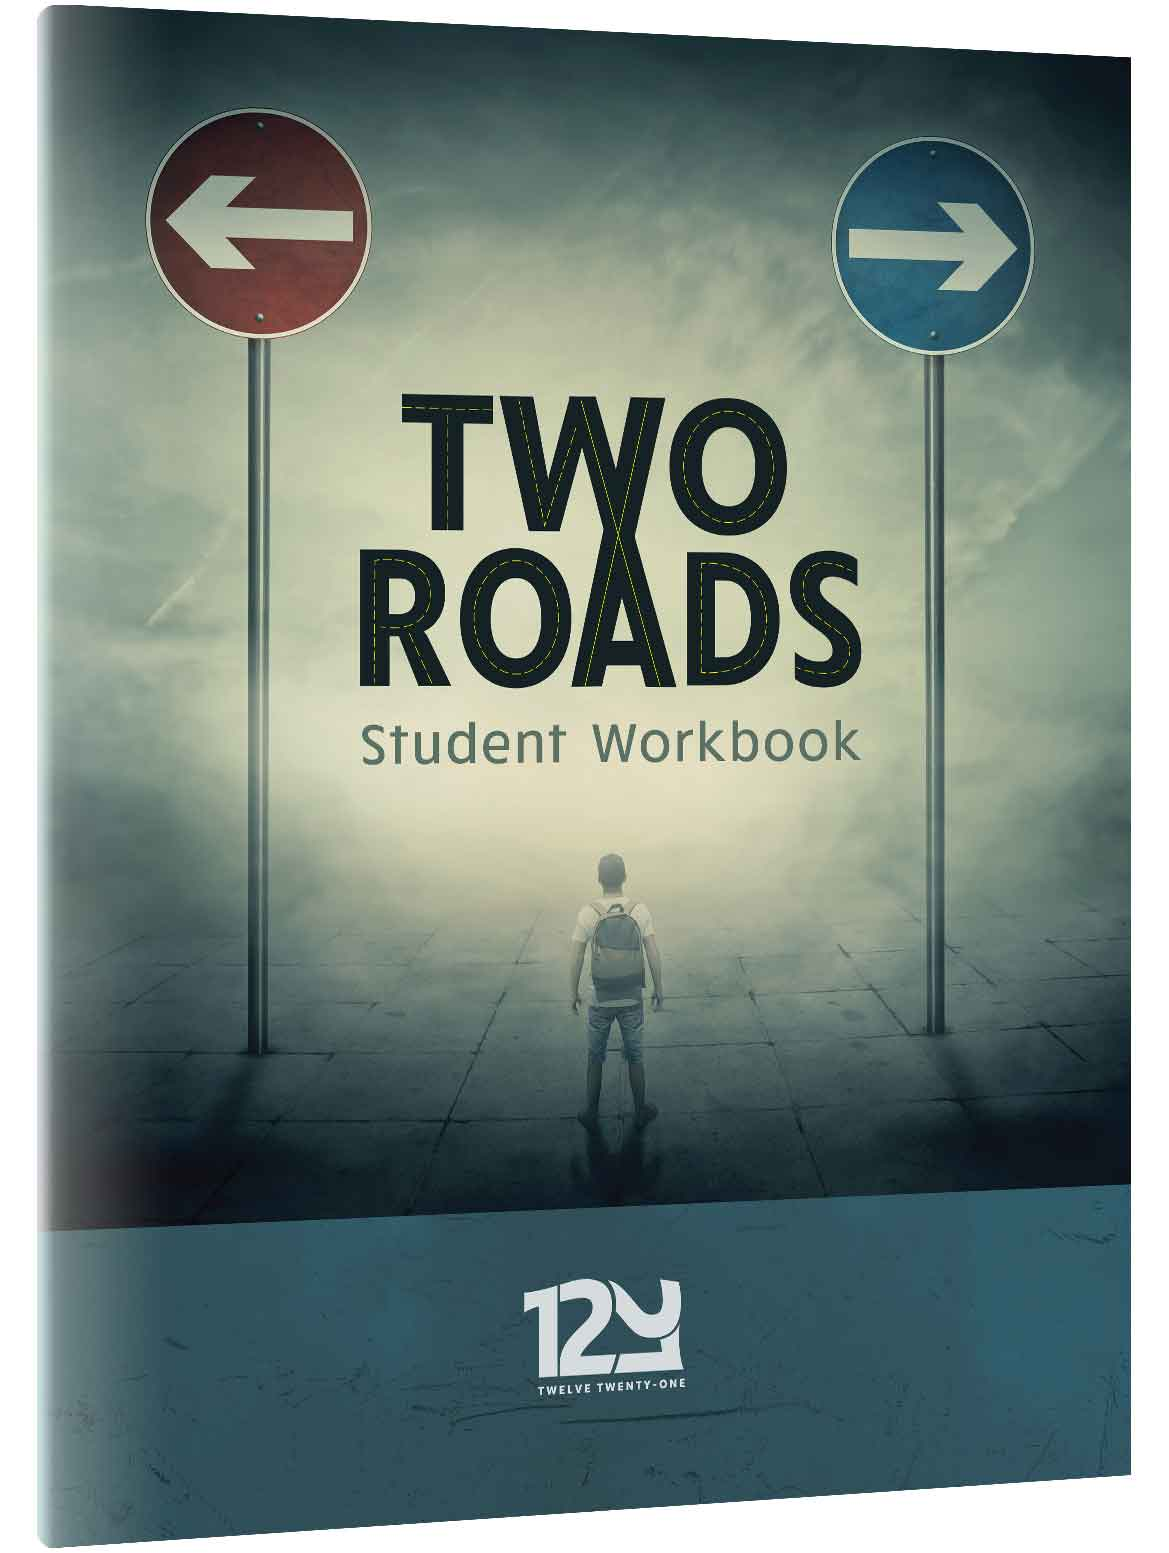 kids teens 12 21 two roads 12 21 student workbook first